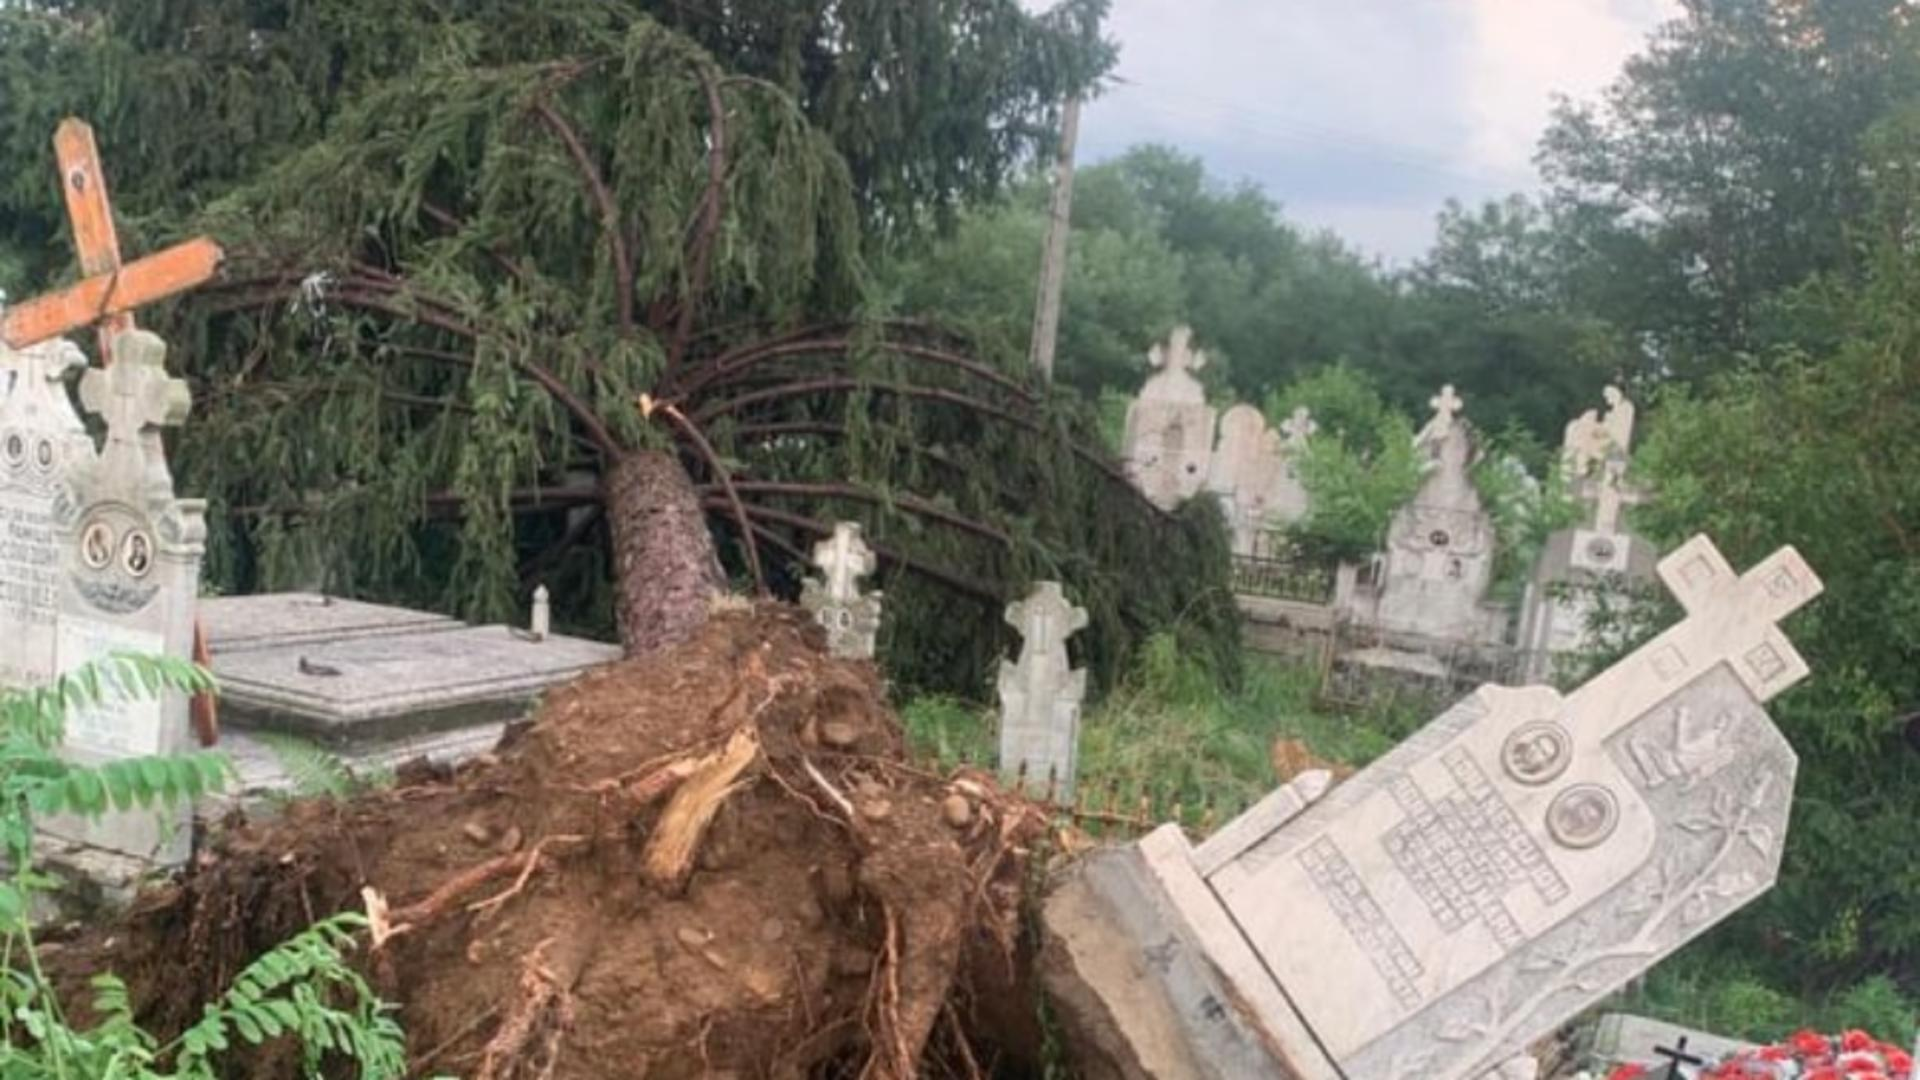 Furtună în Gorj